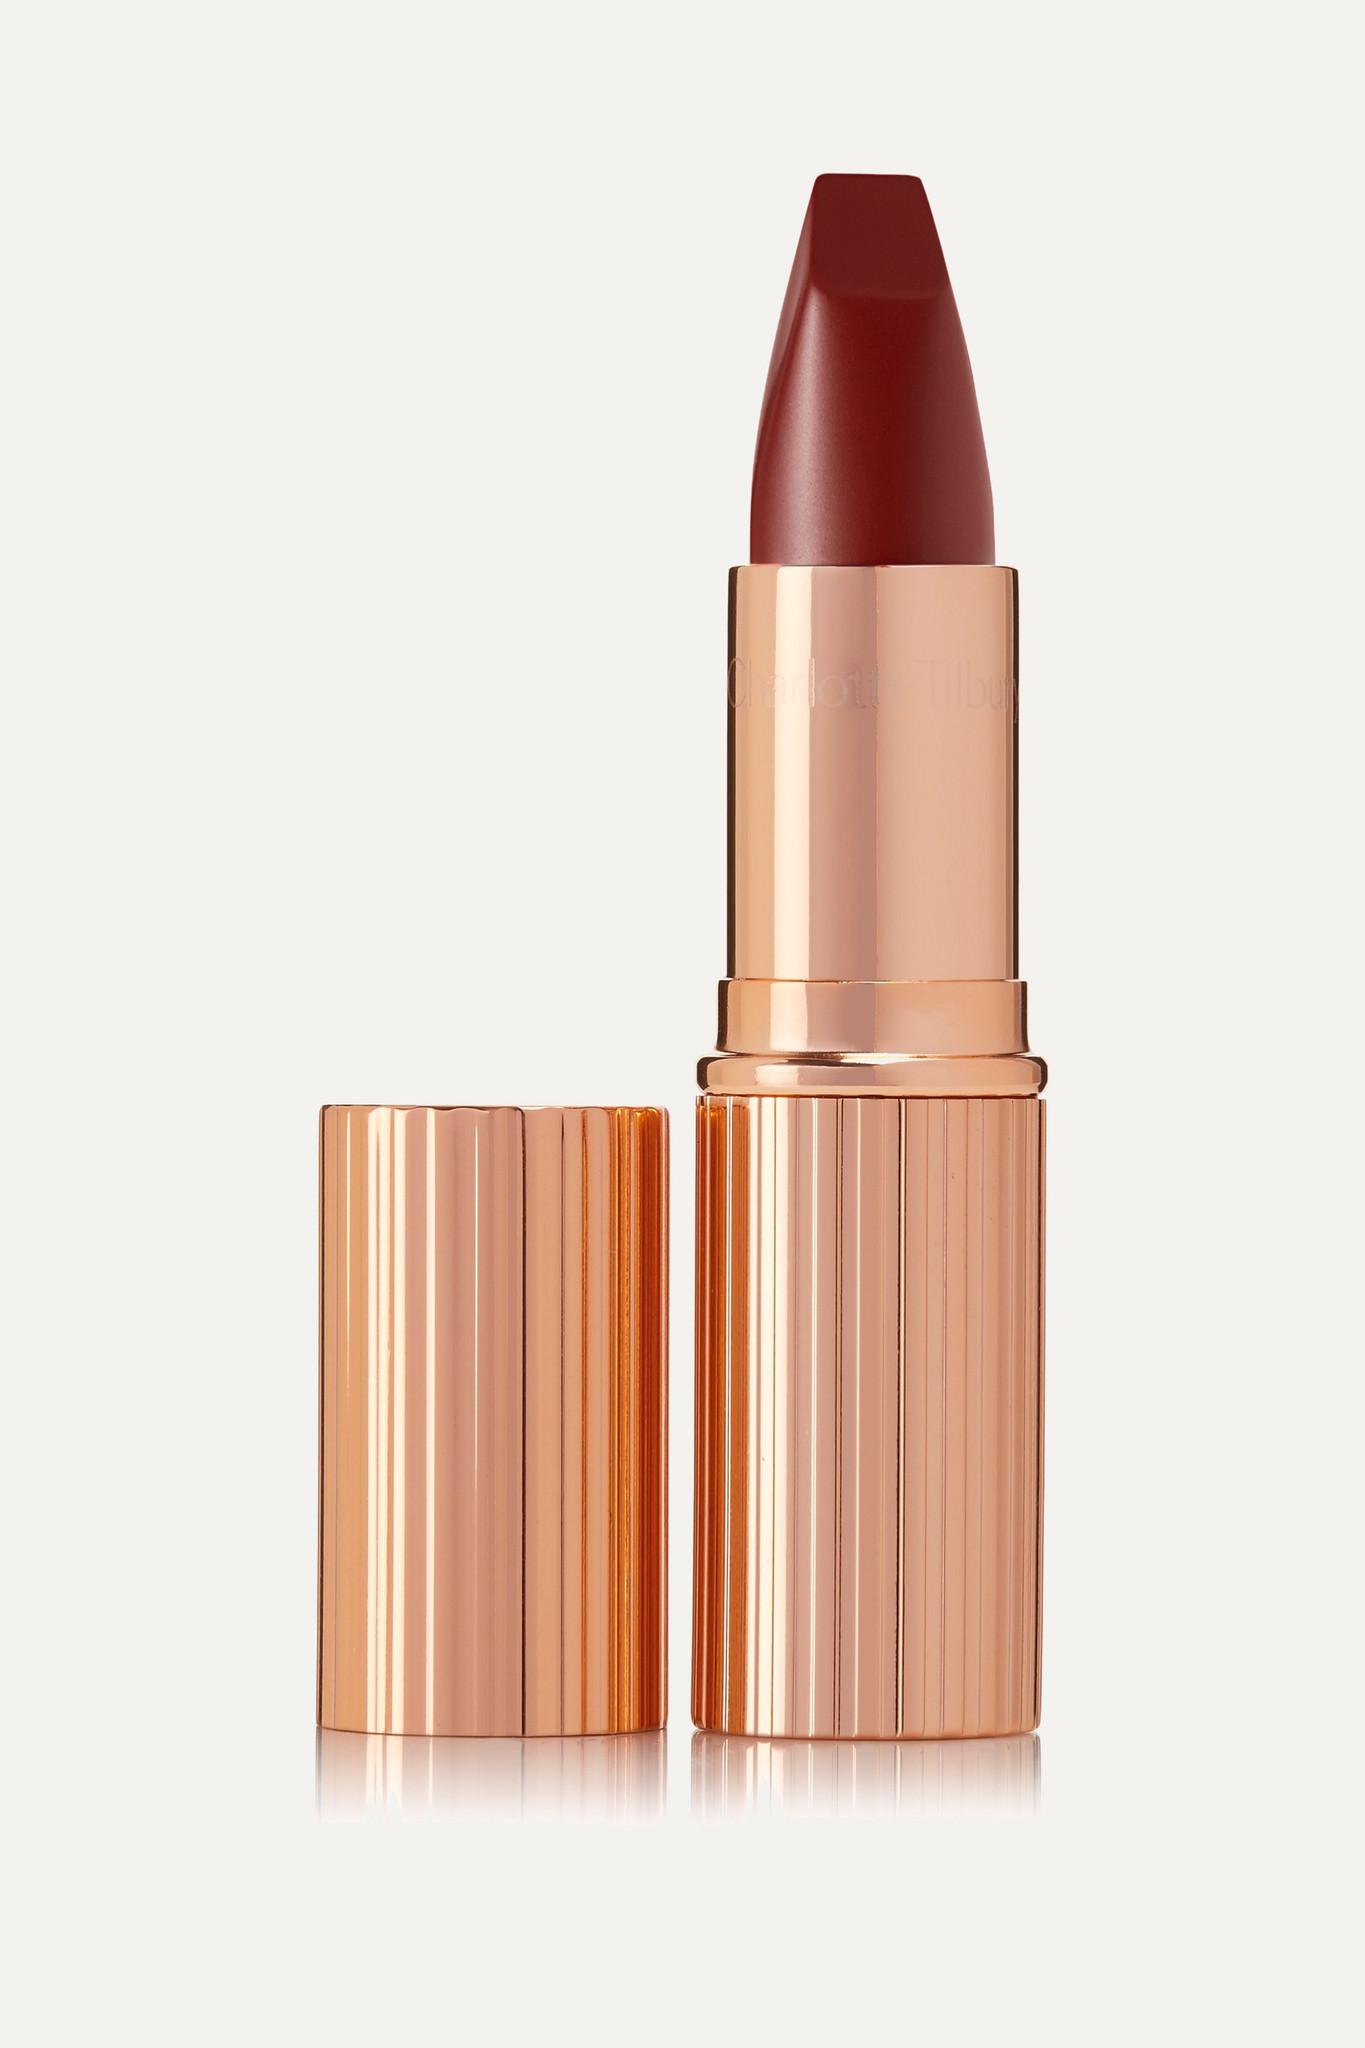 CHARLOTTE TILBURY - Matte Revolution Lipstick - Pillow Talk - Burgundy - one size